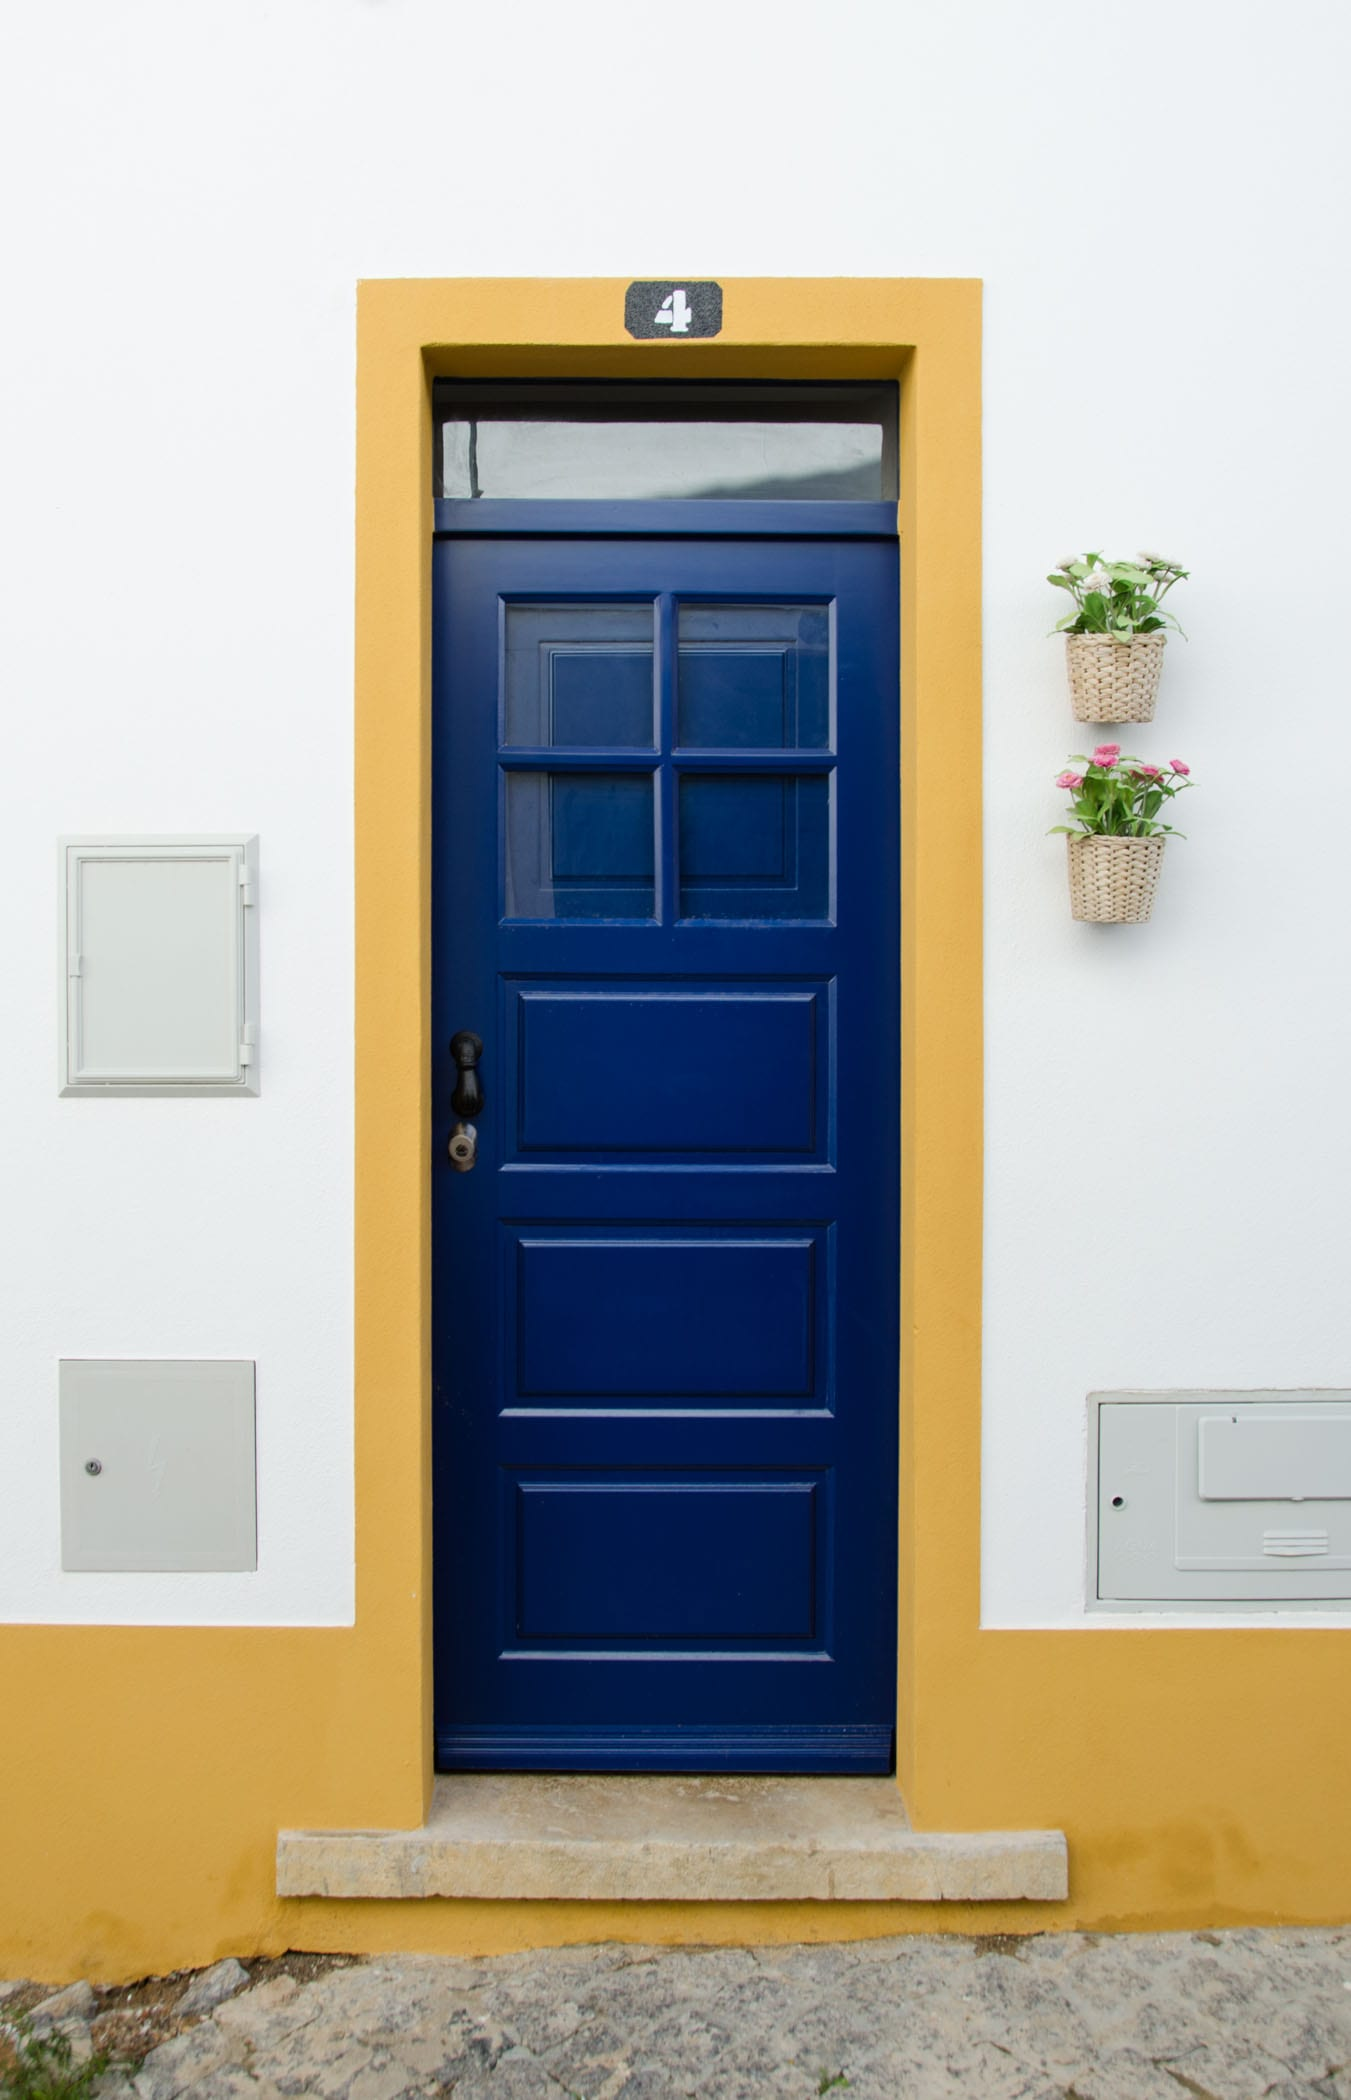 Lagos, doors, travel, portugal